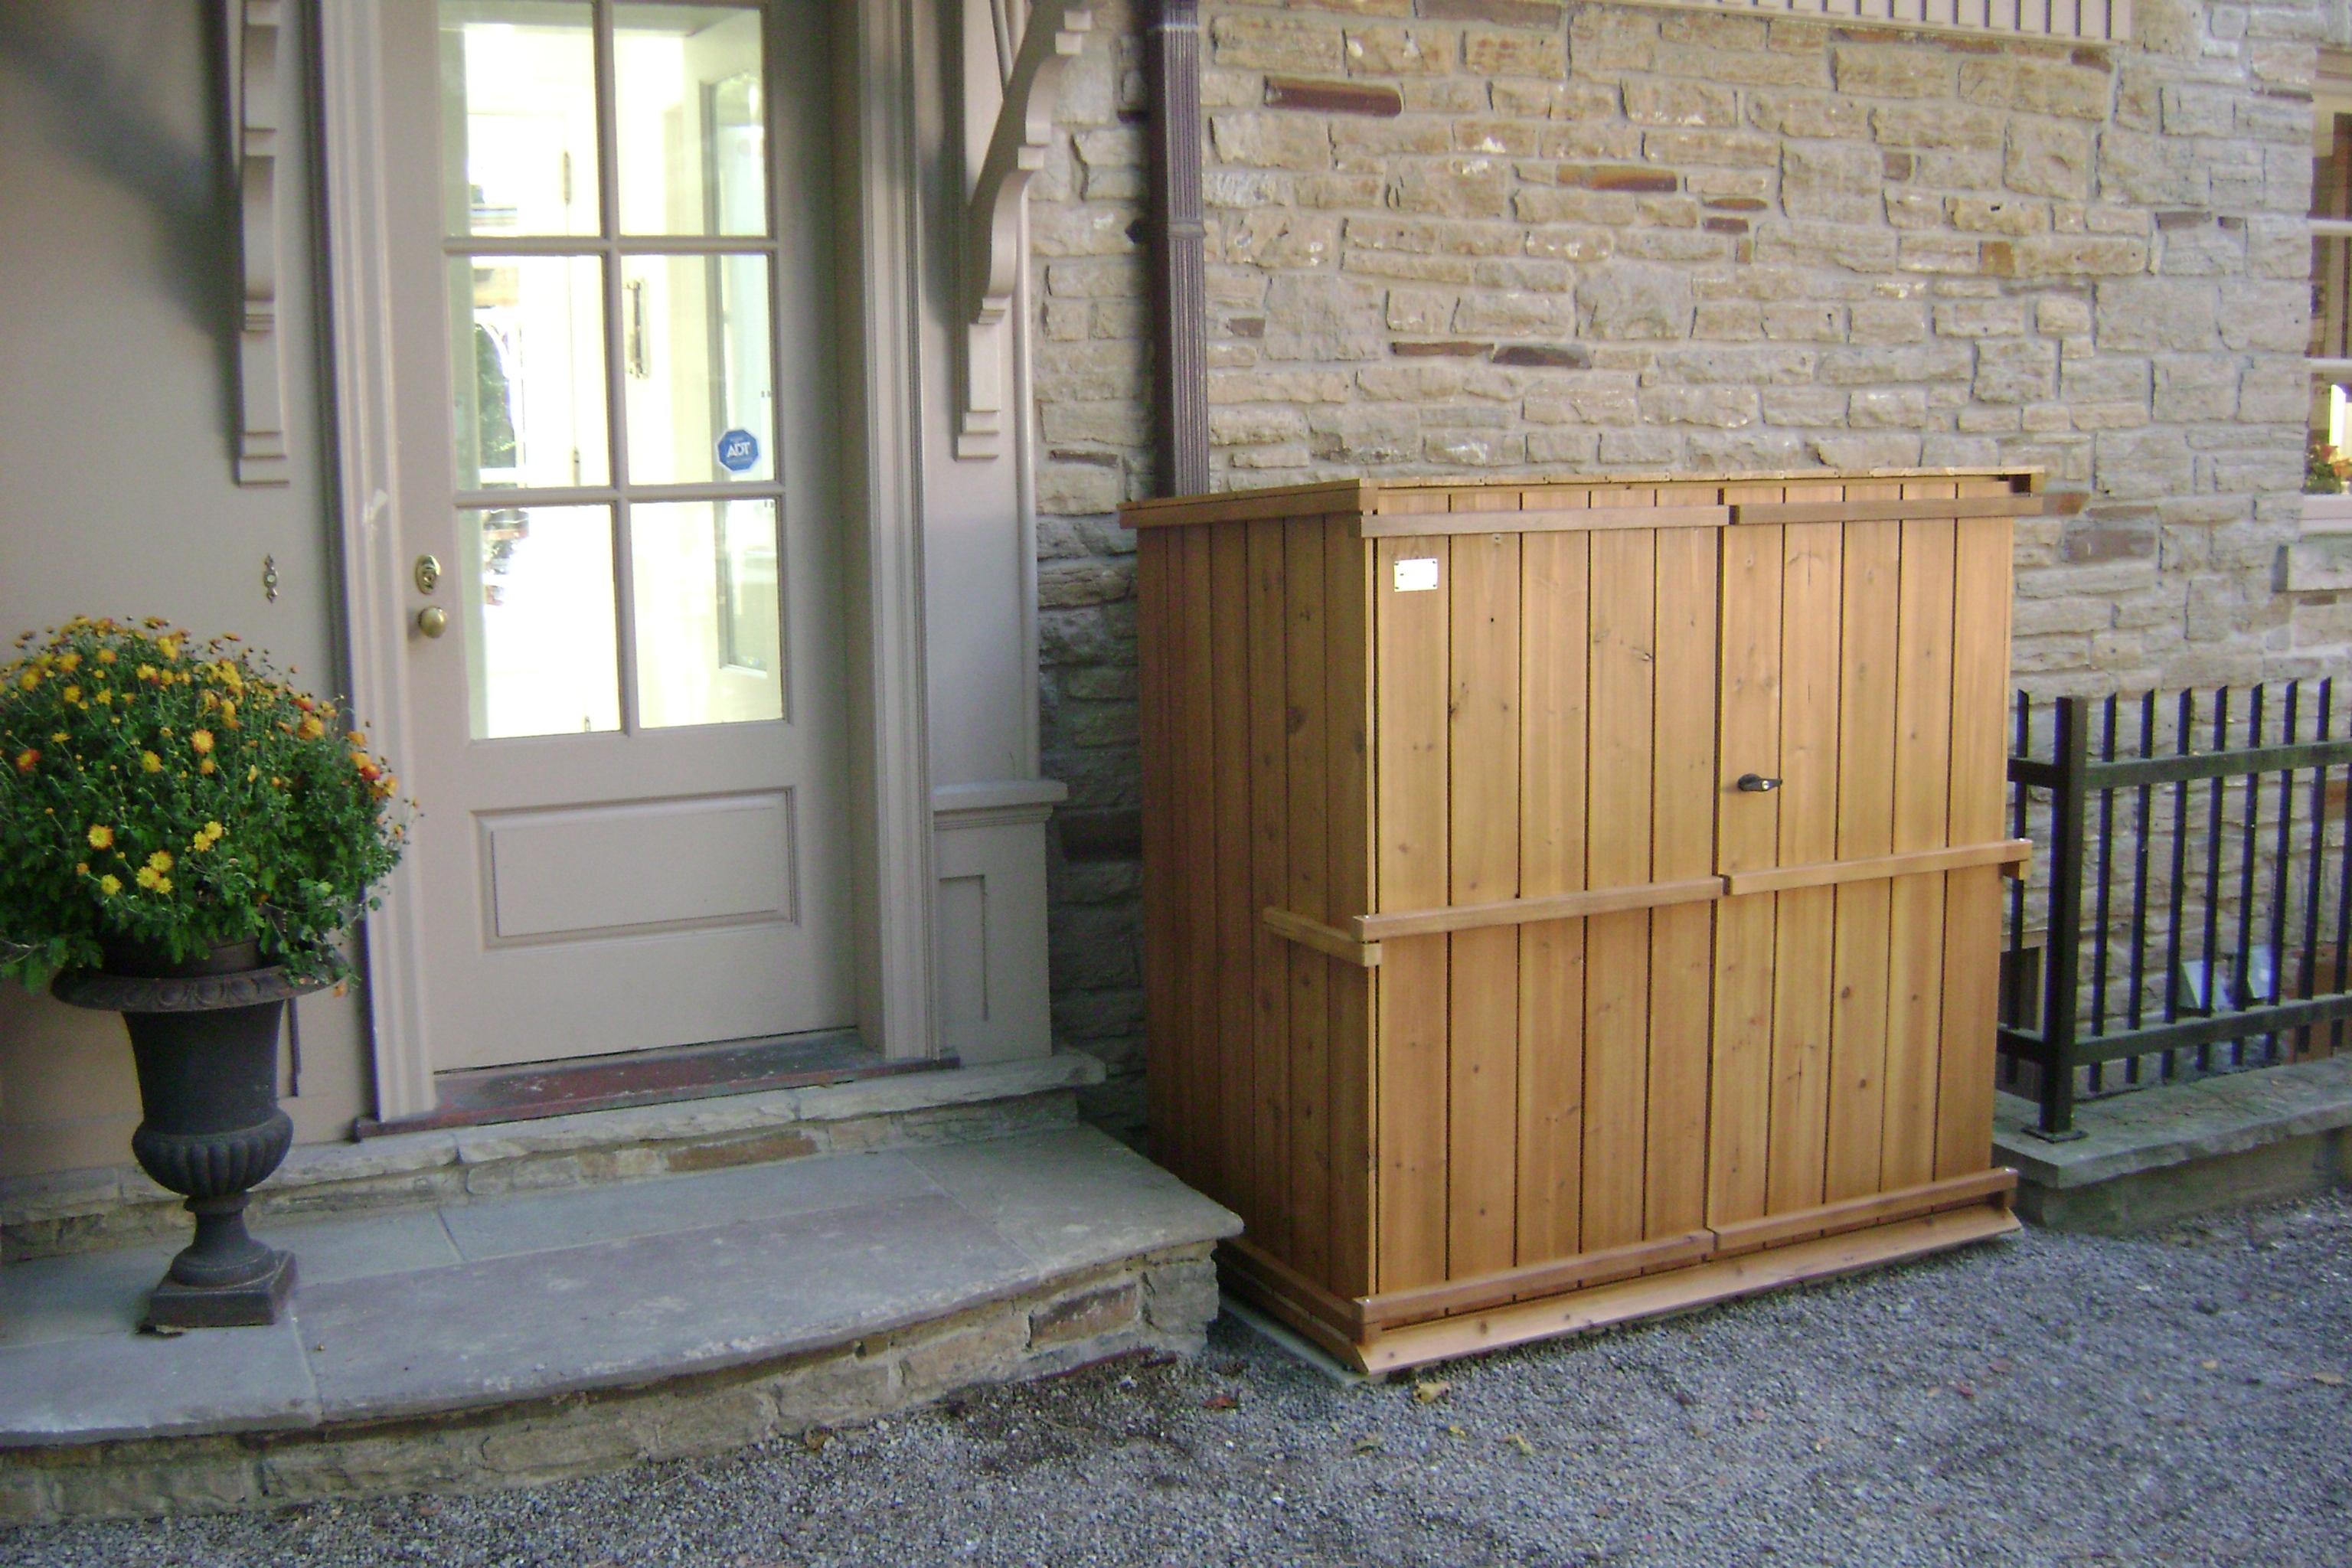 Shed Storage Solutions Xl garbage storage gallery